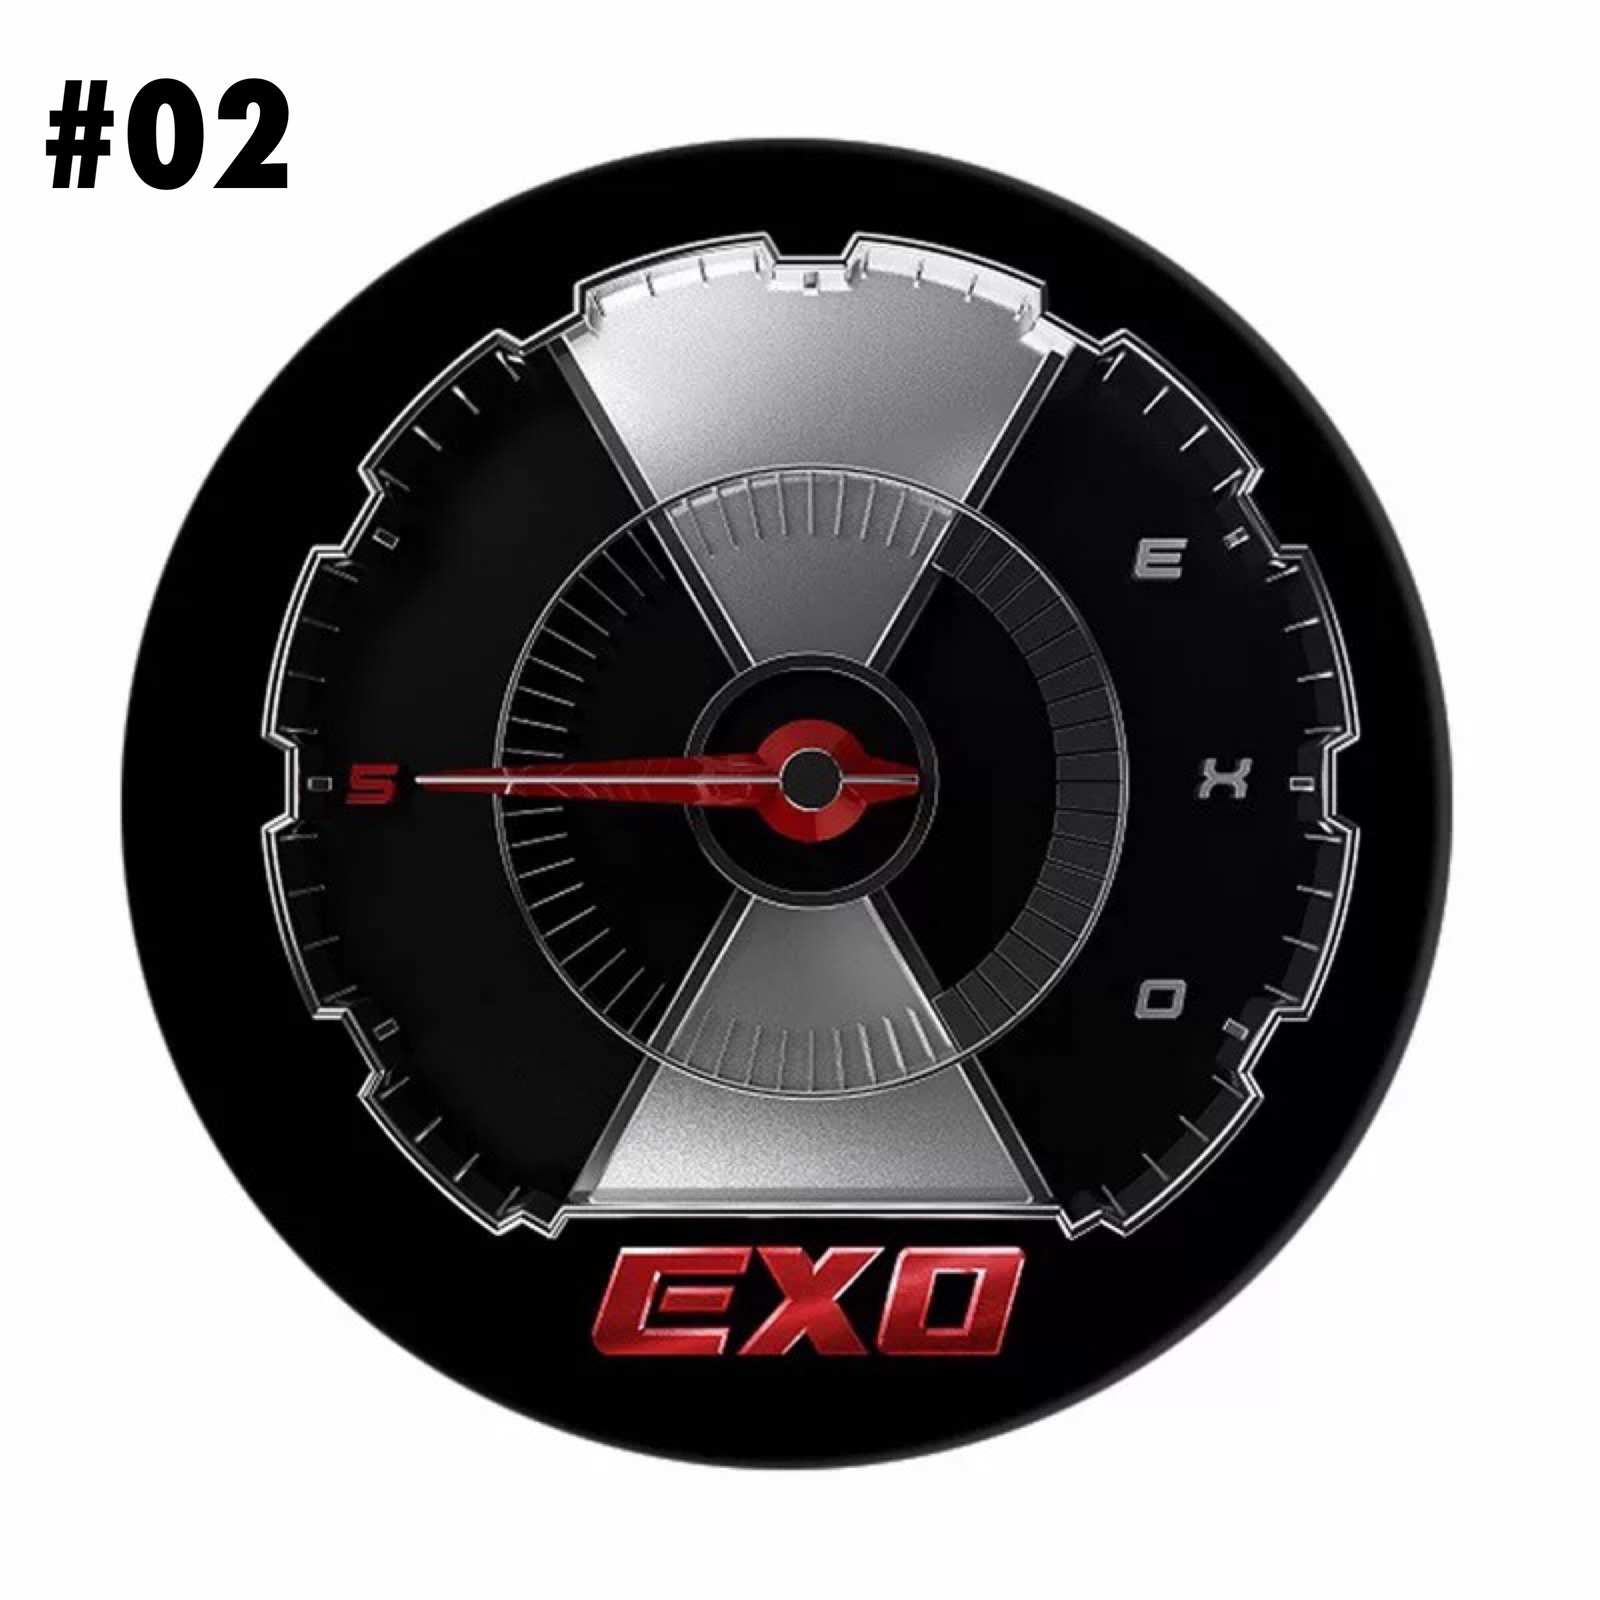 EXO Kpop Chanyeol Baekhyun Badge Brooch Pin Lapel Backpack Jewellery Accessories image 3